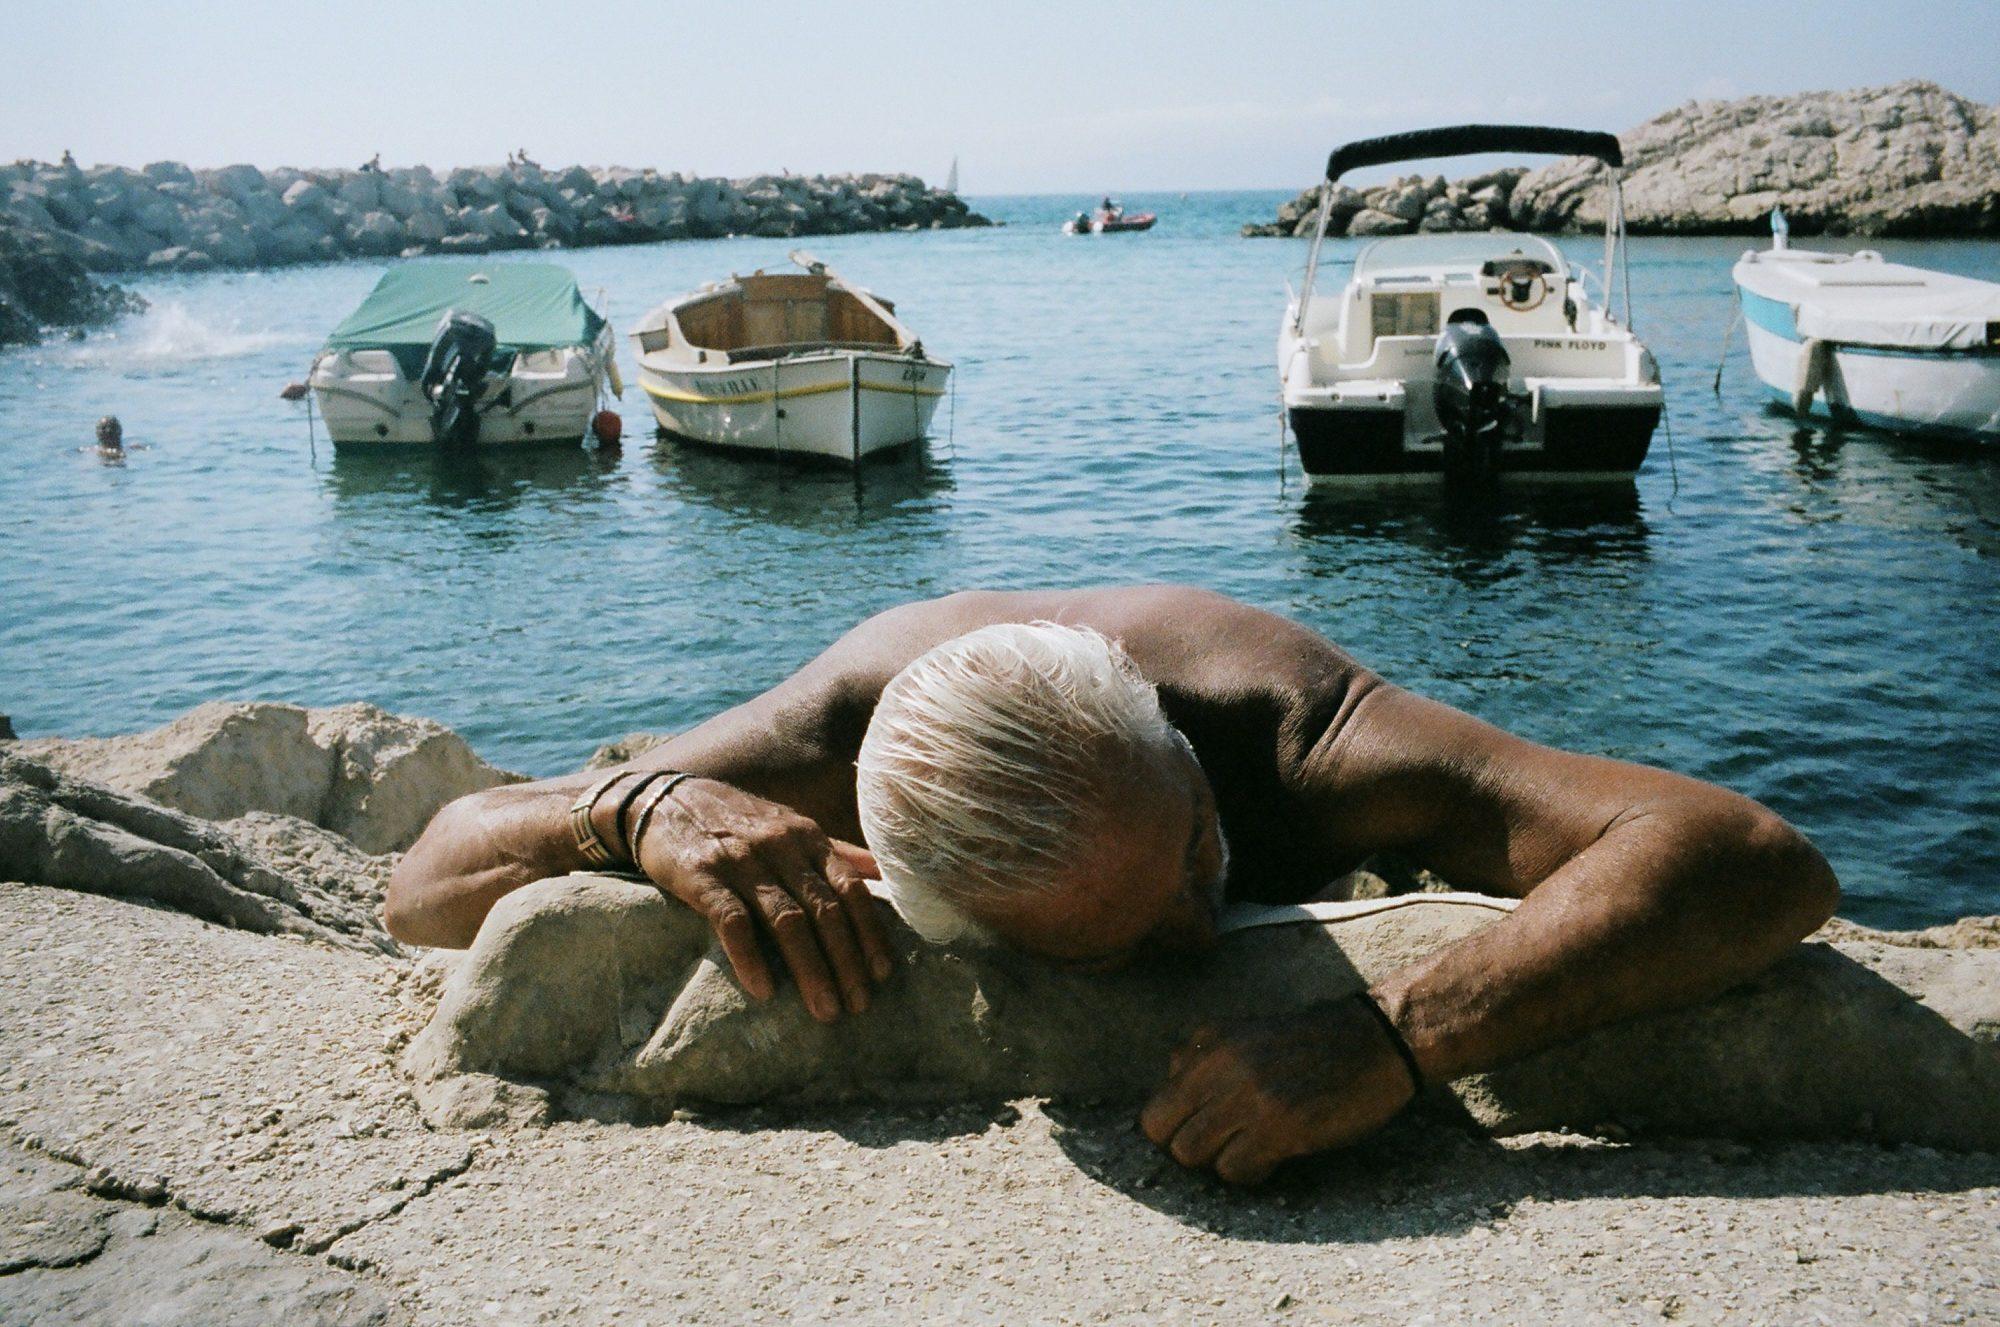 Marseille man at beach. Shot on Leica M6, Kodak Portra 400, around 1.8 meters on 35mm lens.